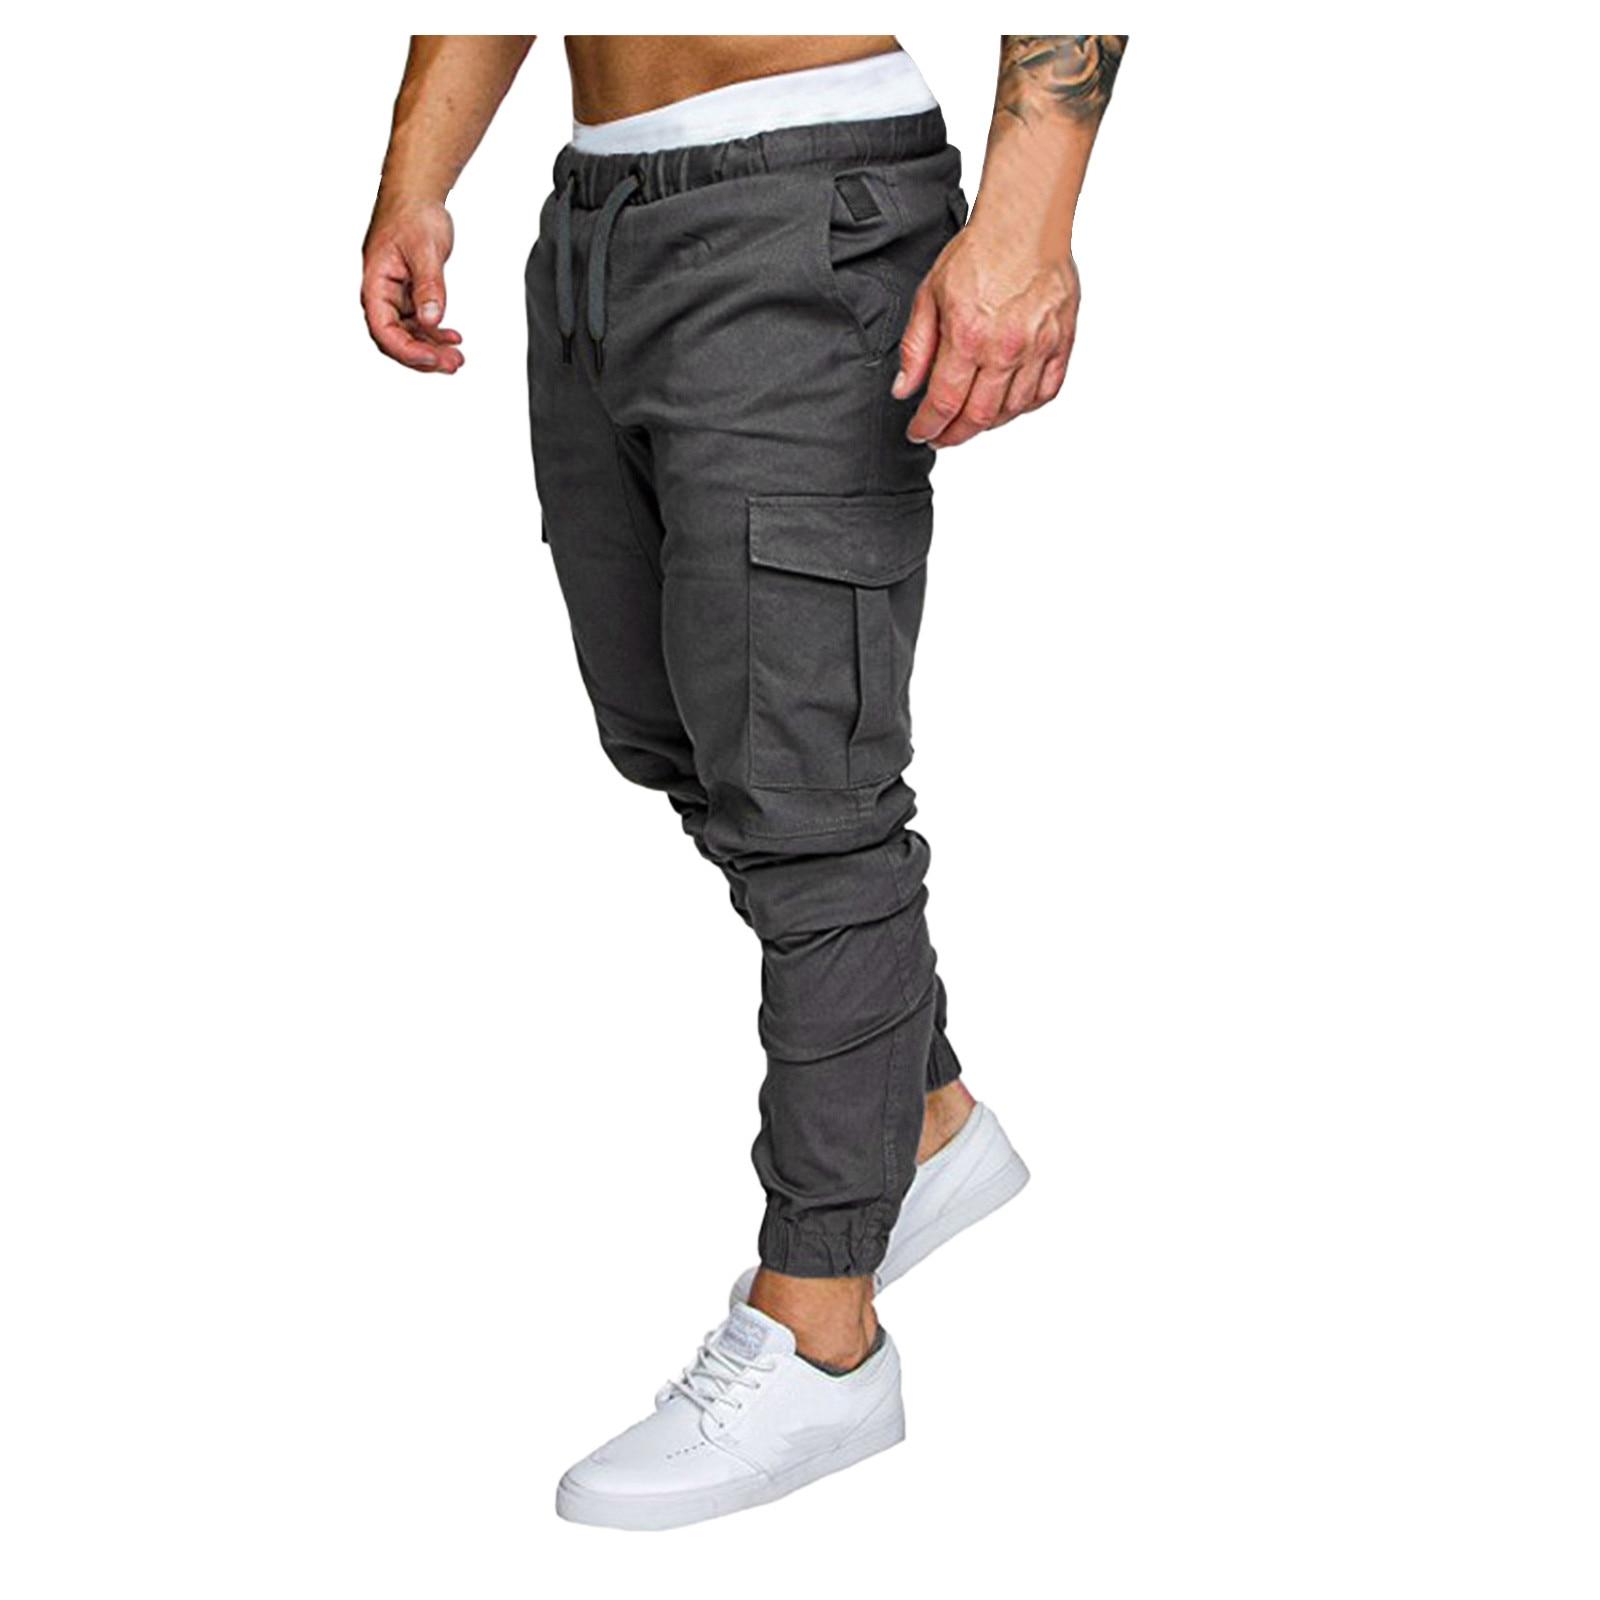 Casual Jogger Men's Multi-pocket Drawstring Pants Men's Casual Pants 2021 Gym Fashion Workout Sweatp